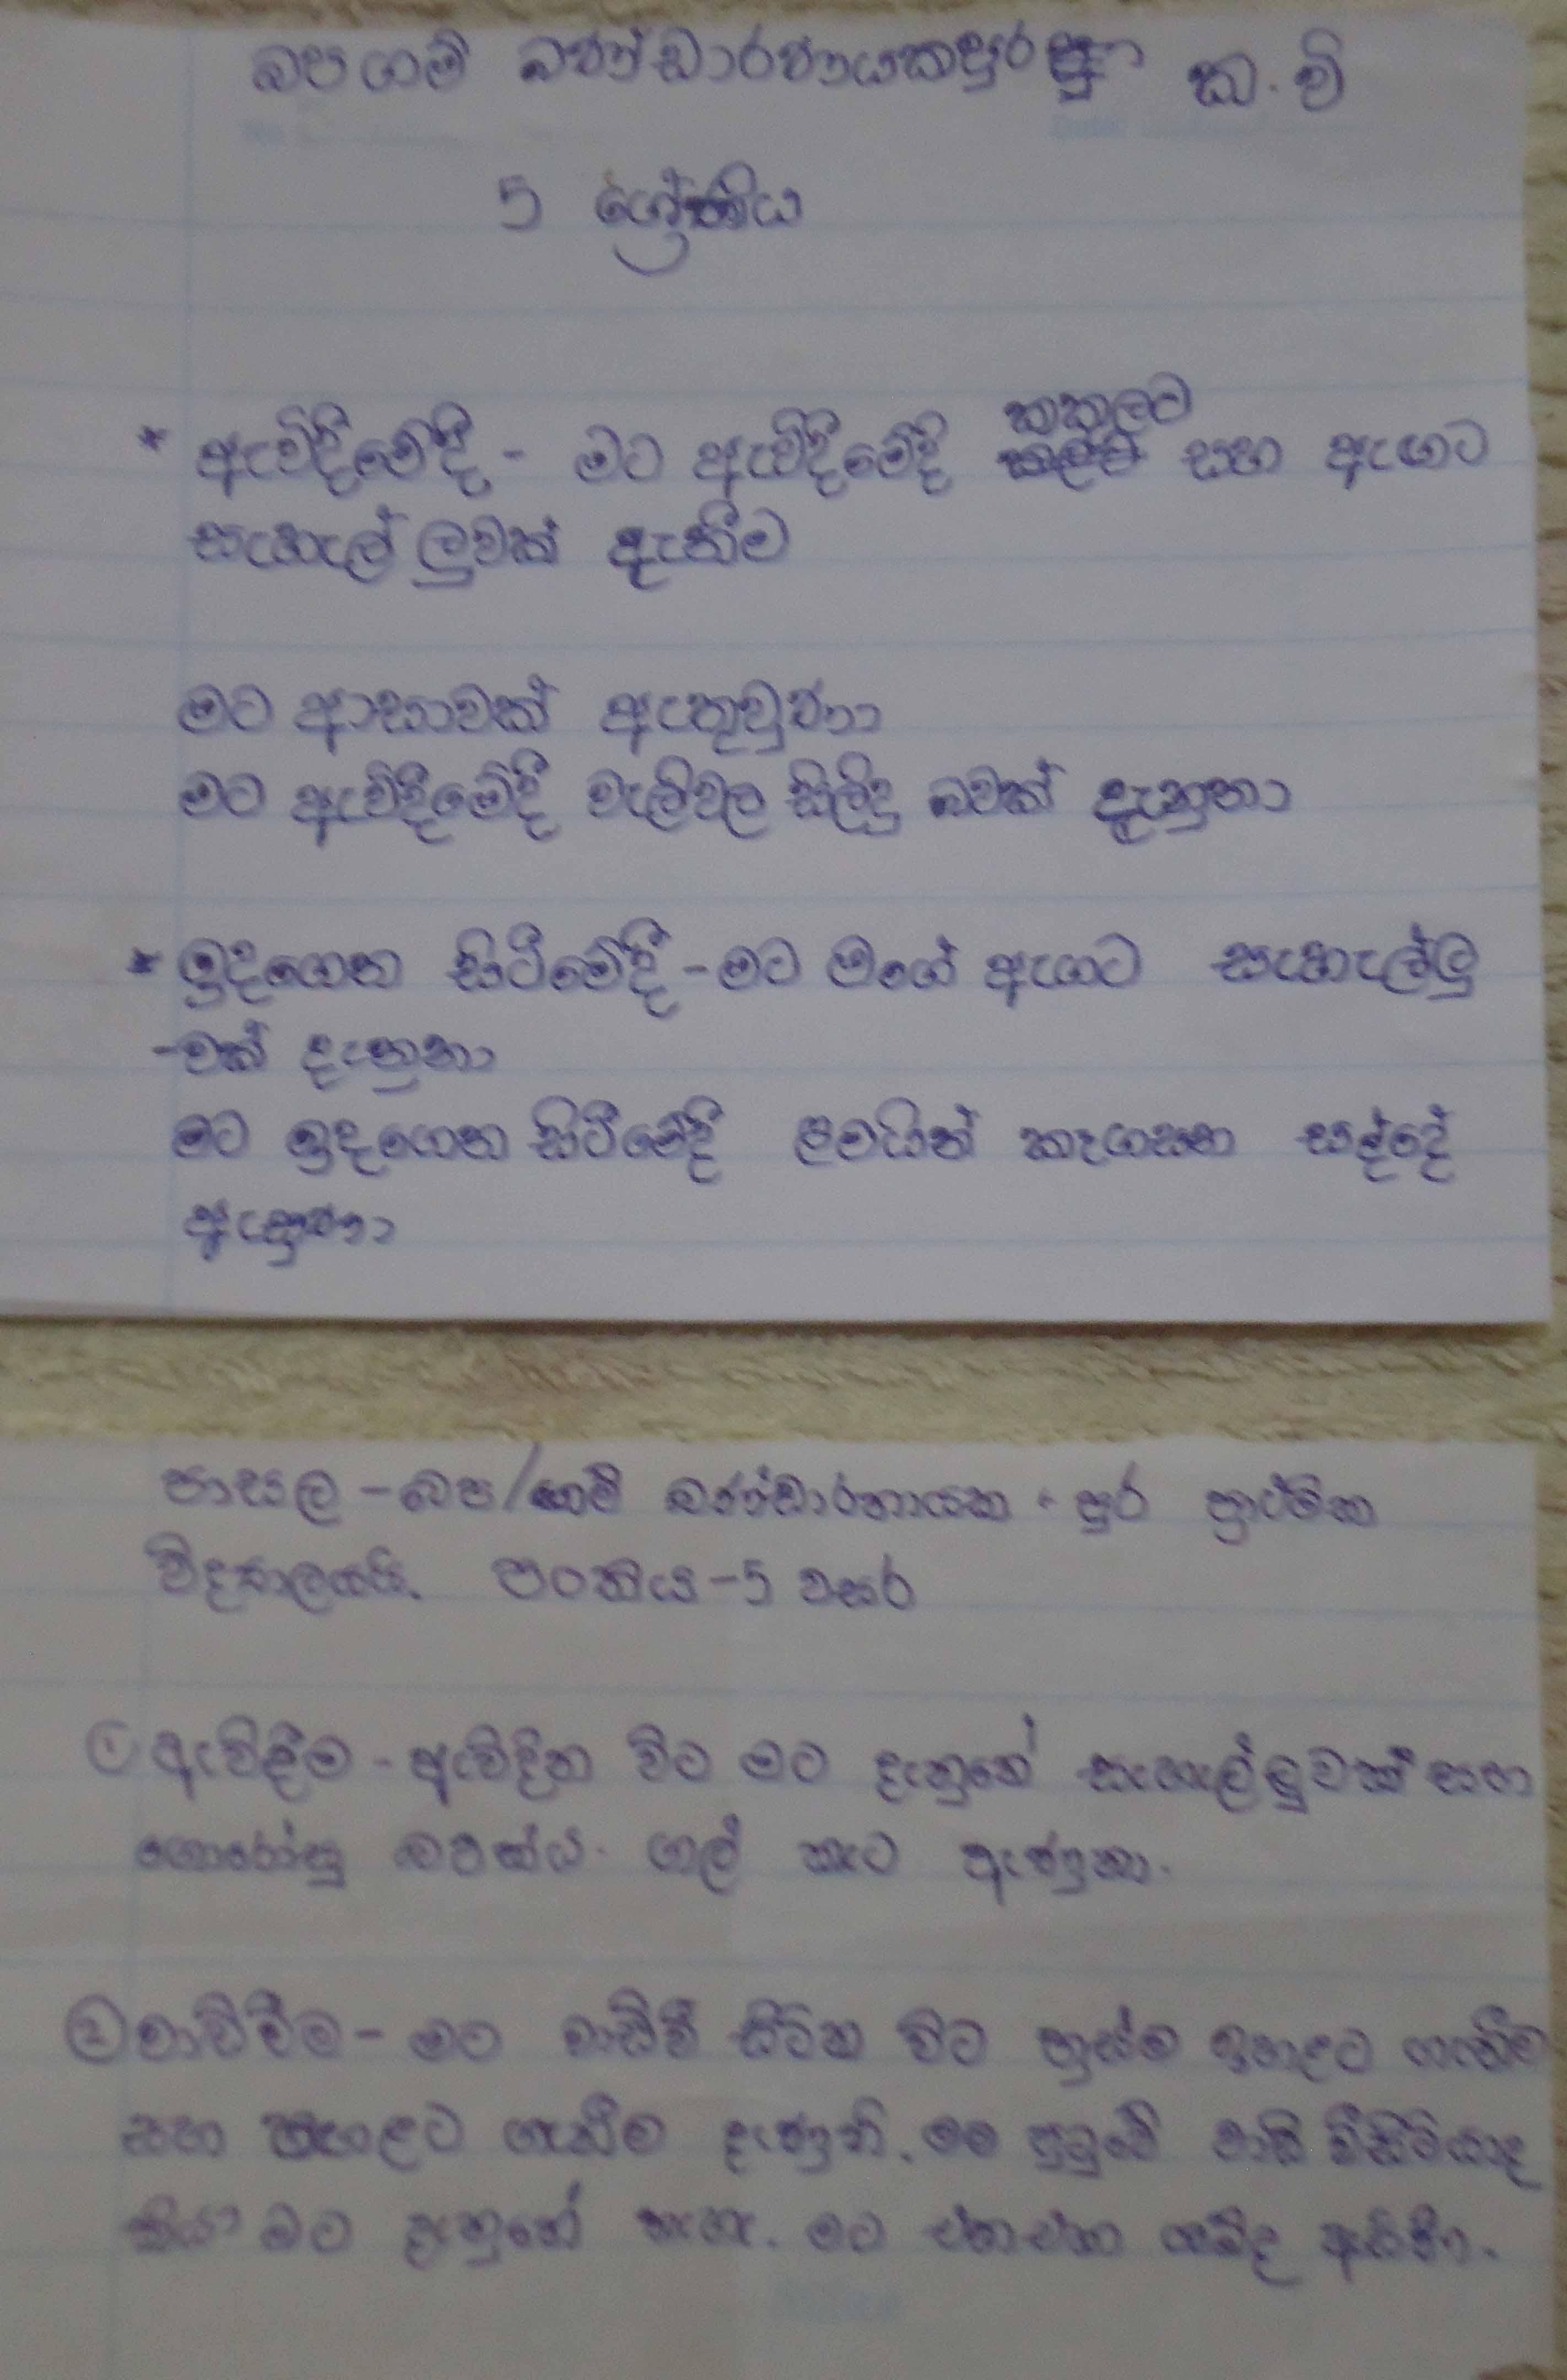 Feedback from students-WP GM Bandaranayakepura Primary School, Kirindiwela (6)